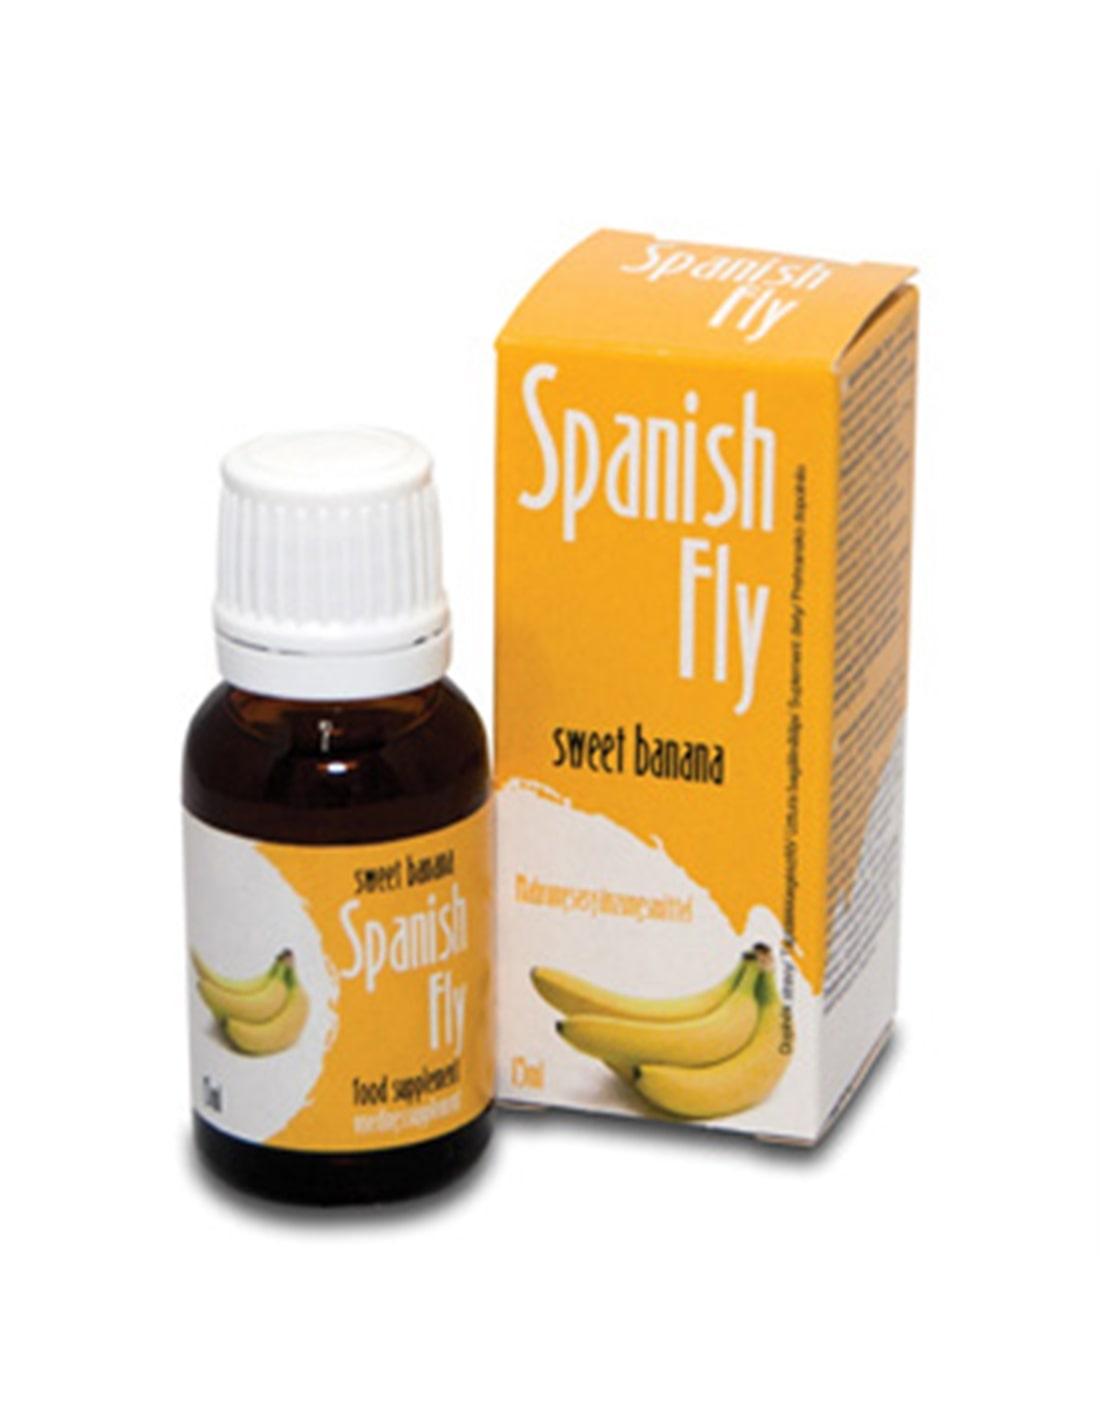 18682 - Gotas Spanish Fly Banana - 15ml-PR2010301540